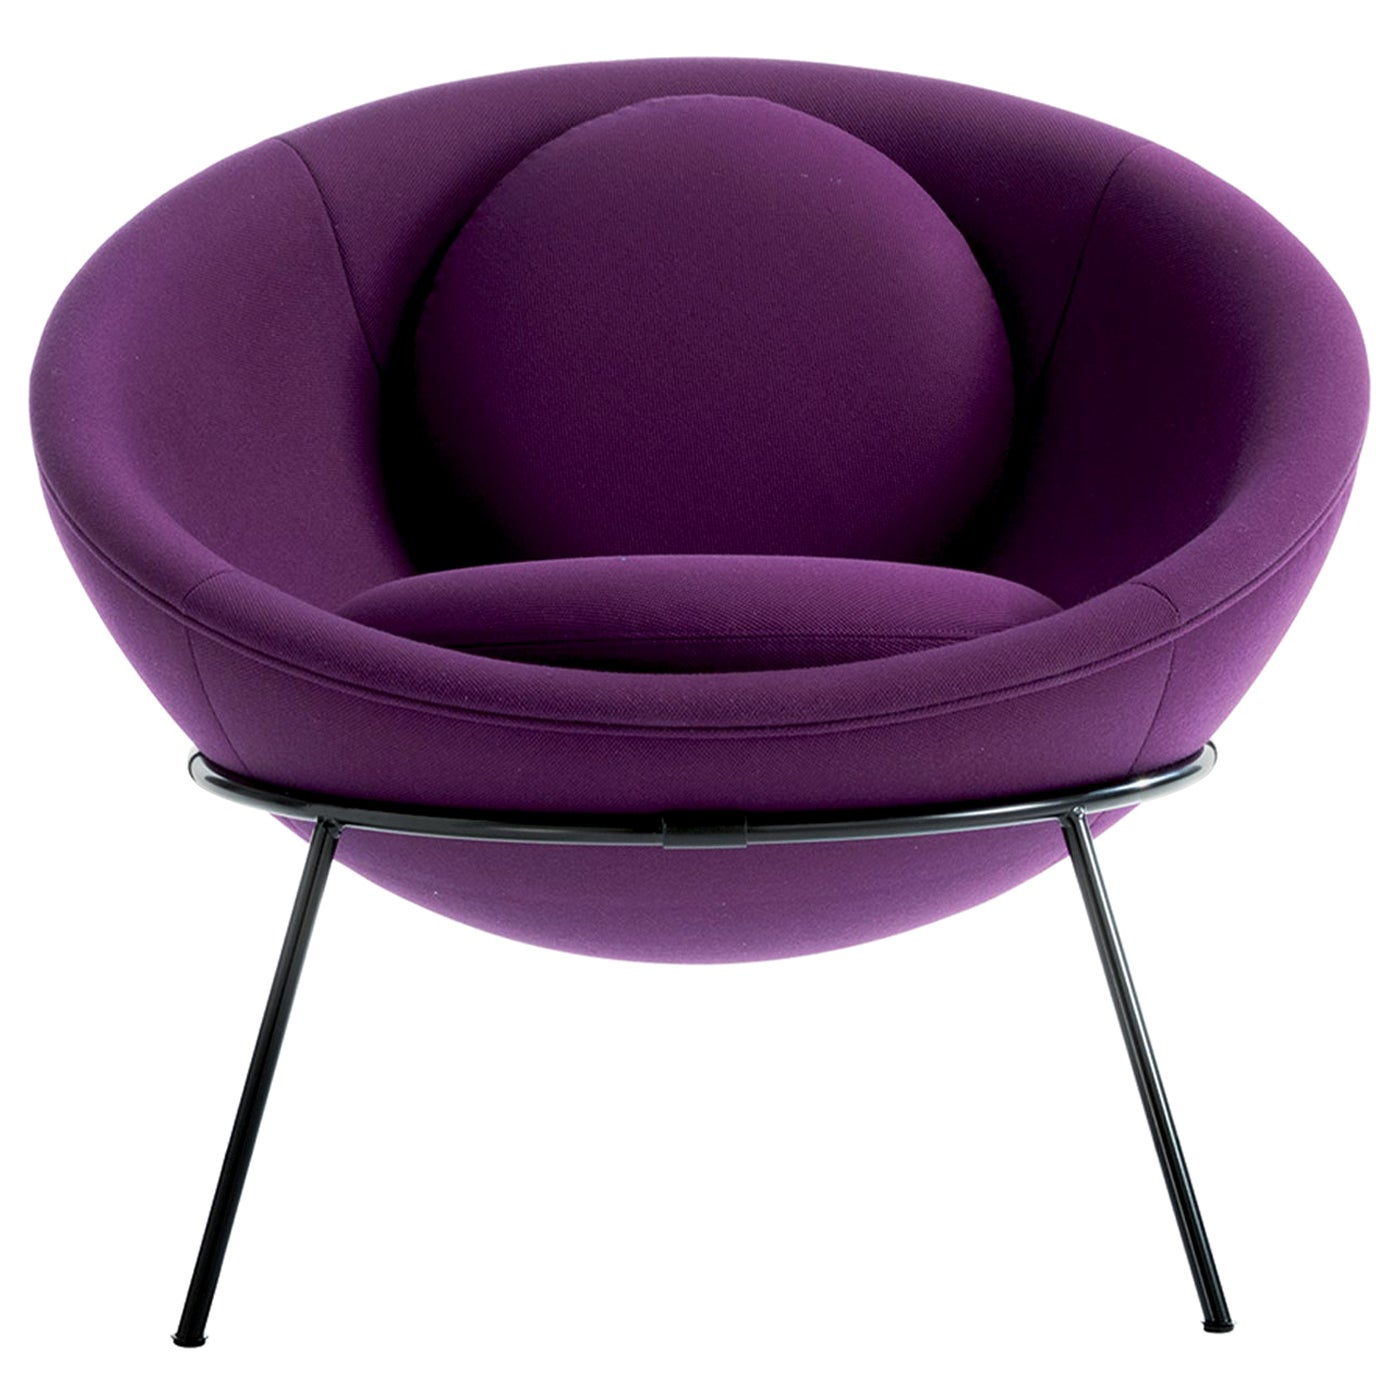 Bardi's Bowl Chair Purple